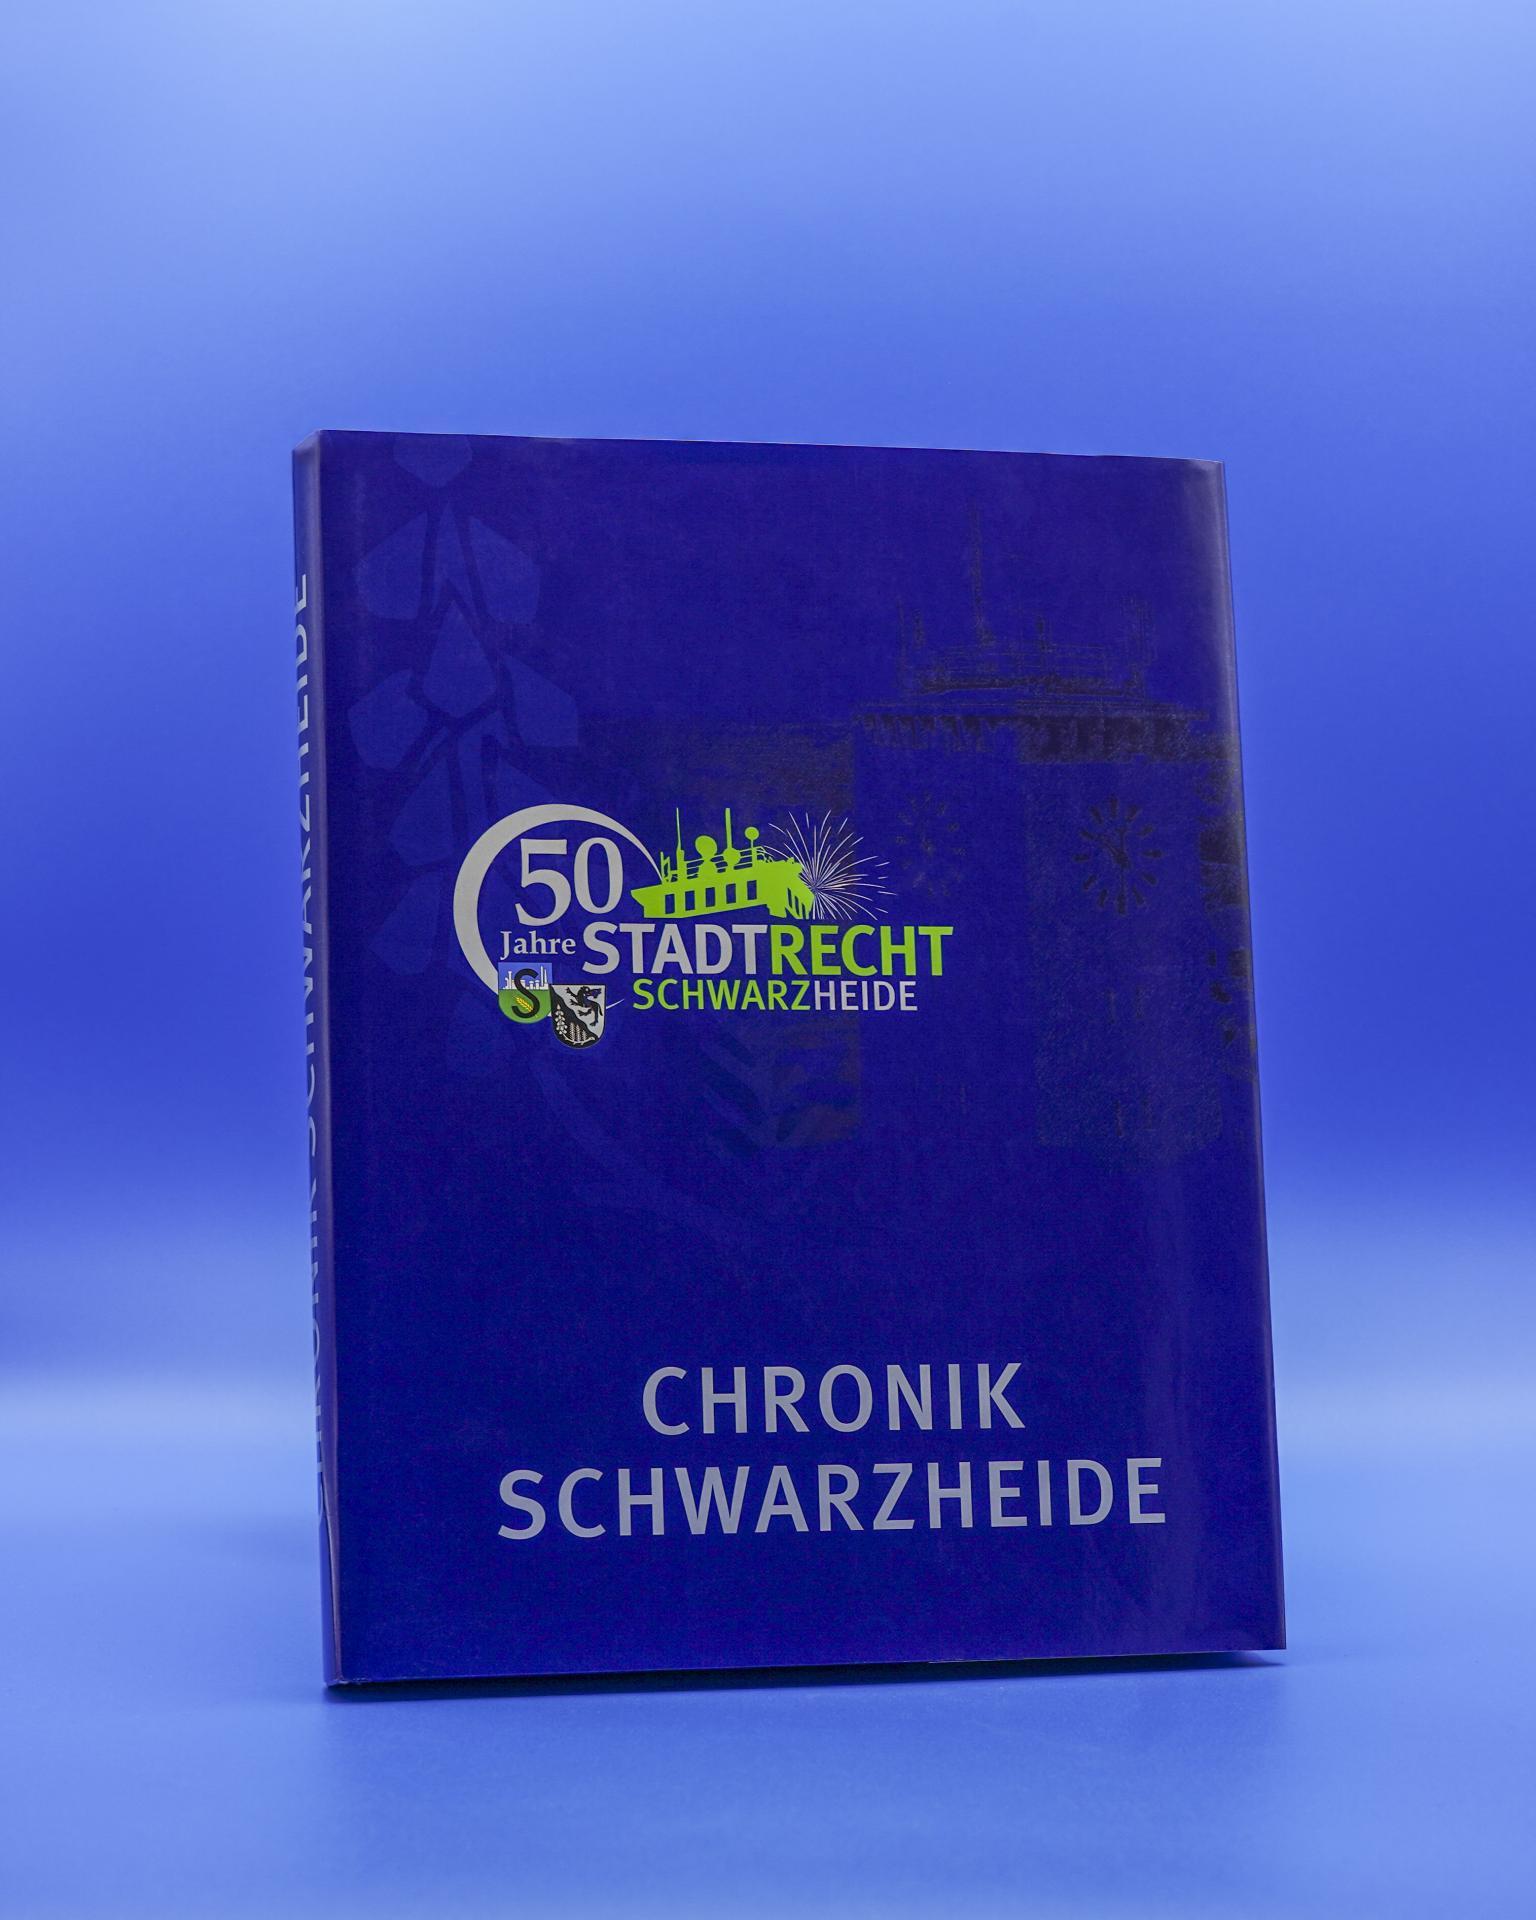 Chronik